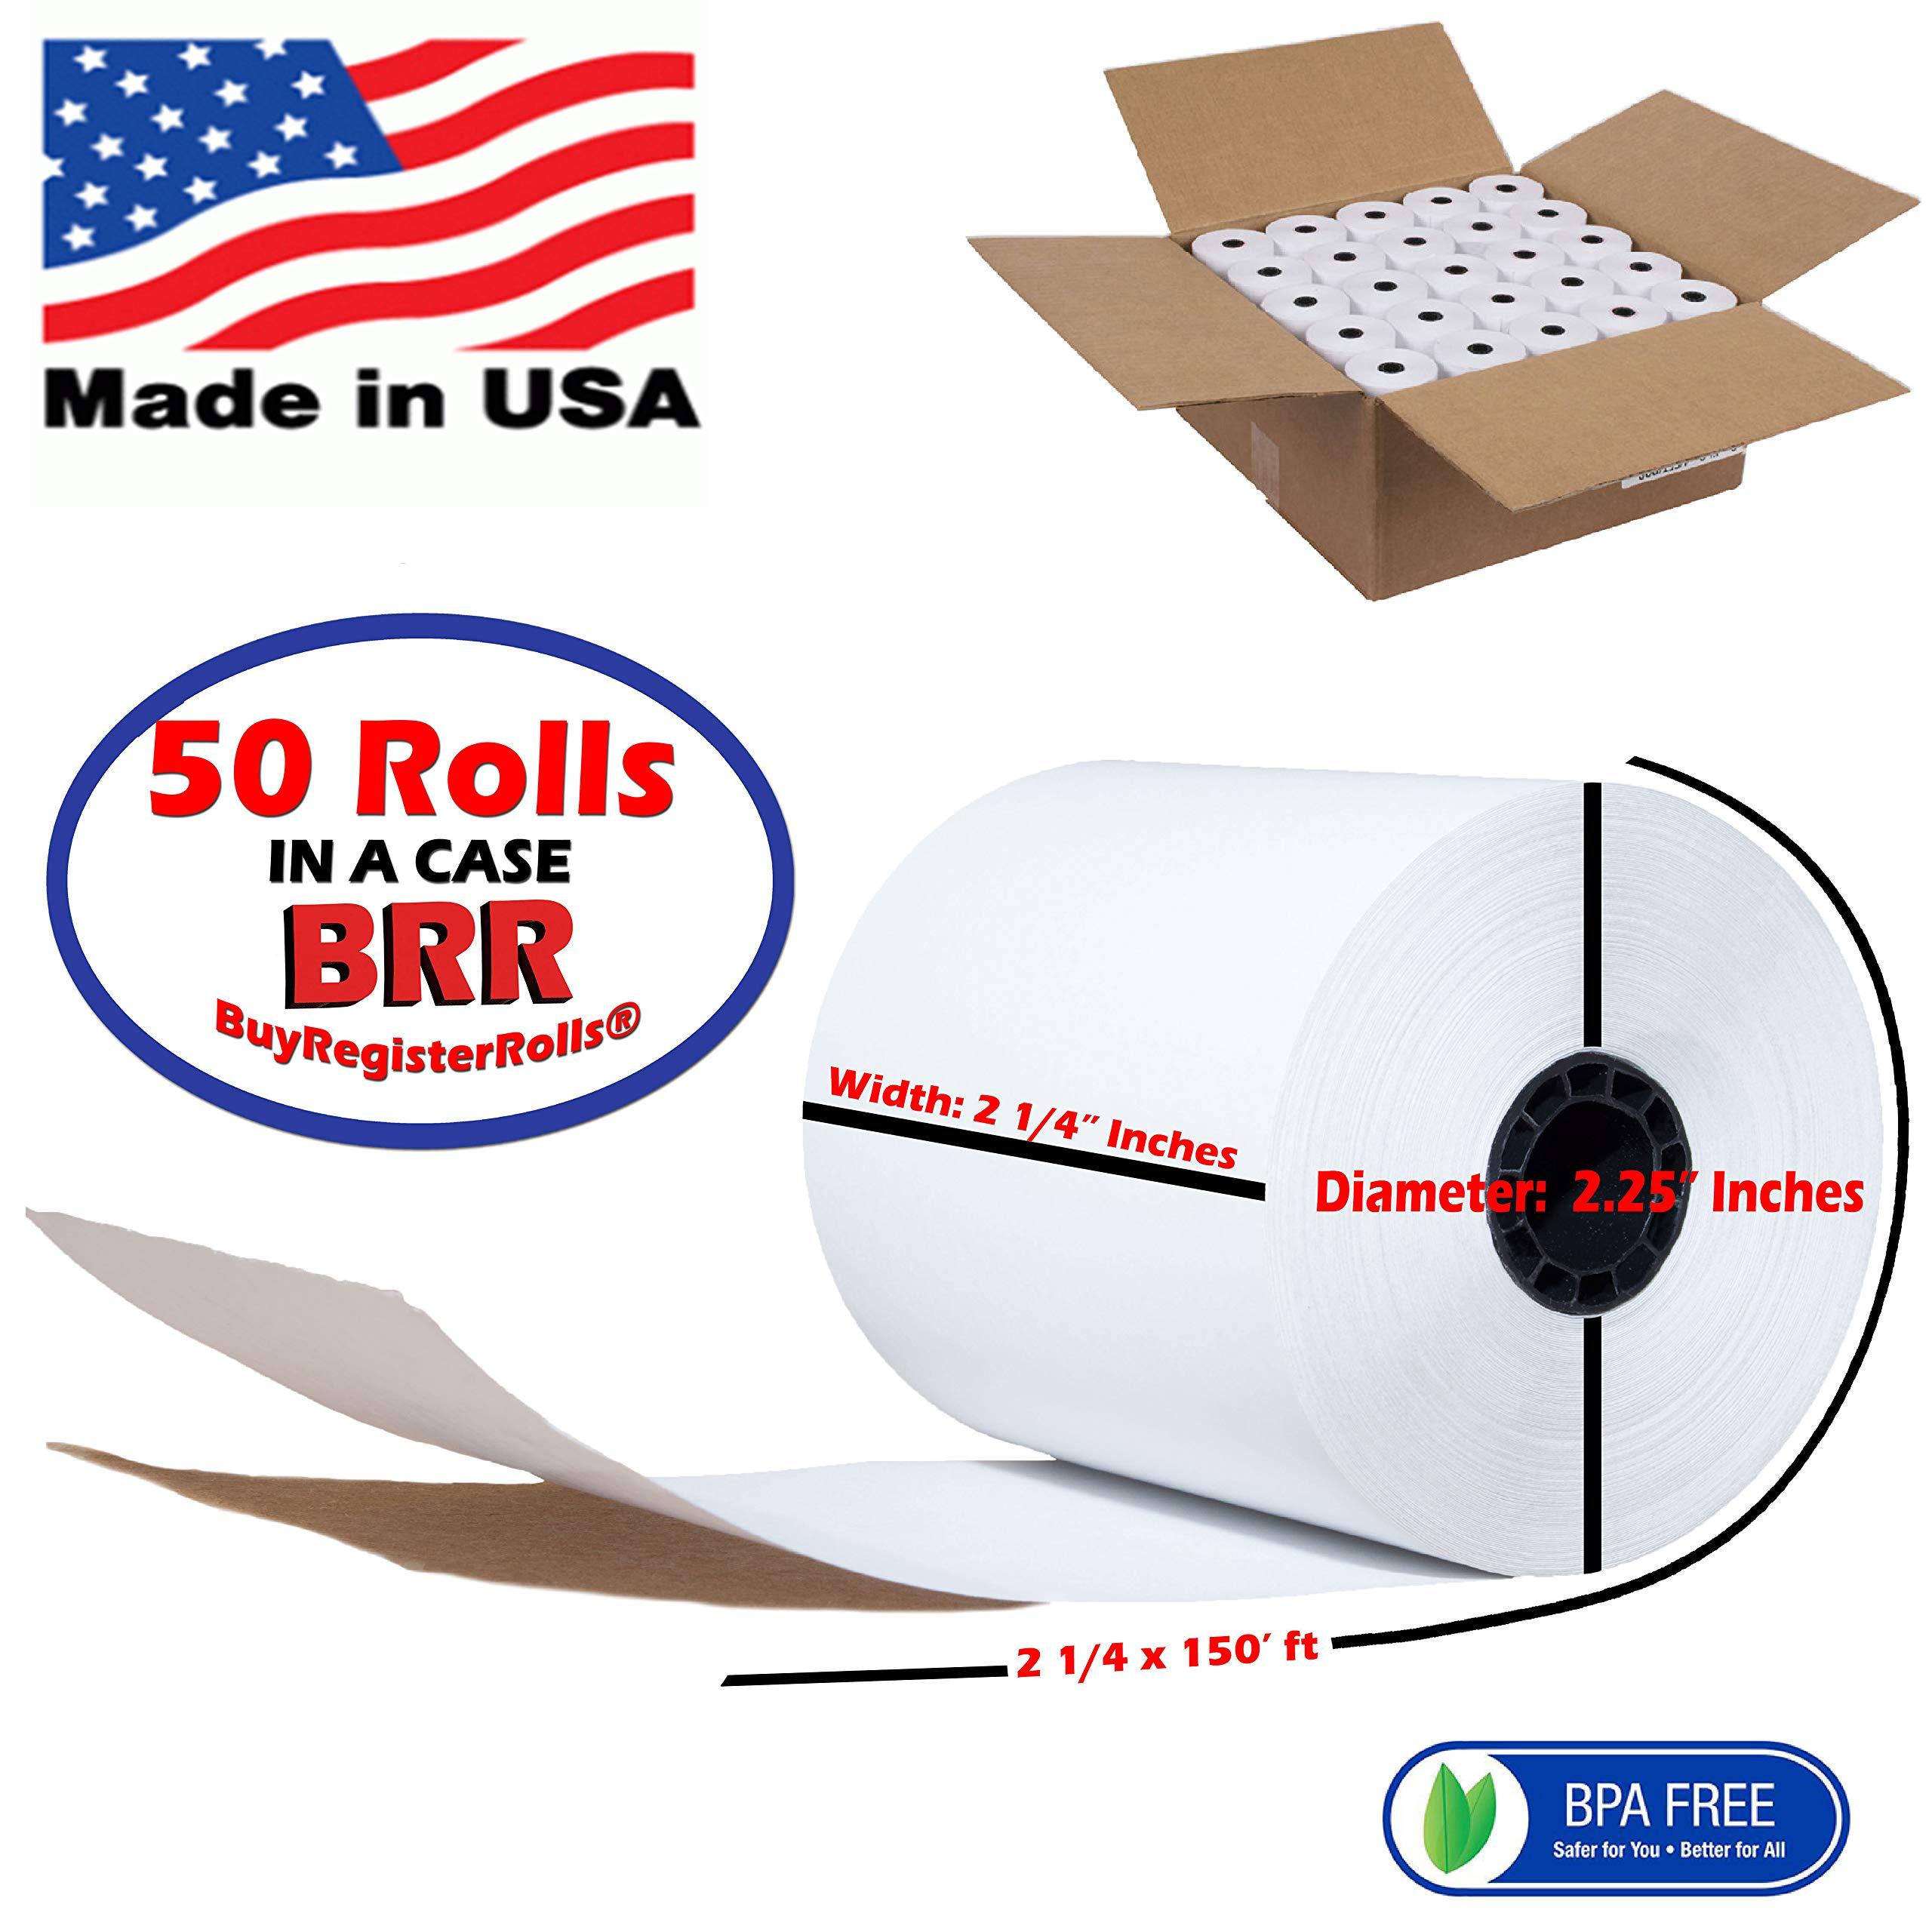 2 1/4 x 150 Thermal Paper Rolls 50 Rolls | Value Pack | Premium Quality BPA Free - Thermal Paper Rolls - from BuyRegisterRolls by BuyRegisterRolls